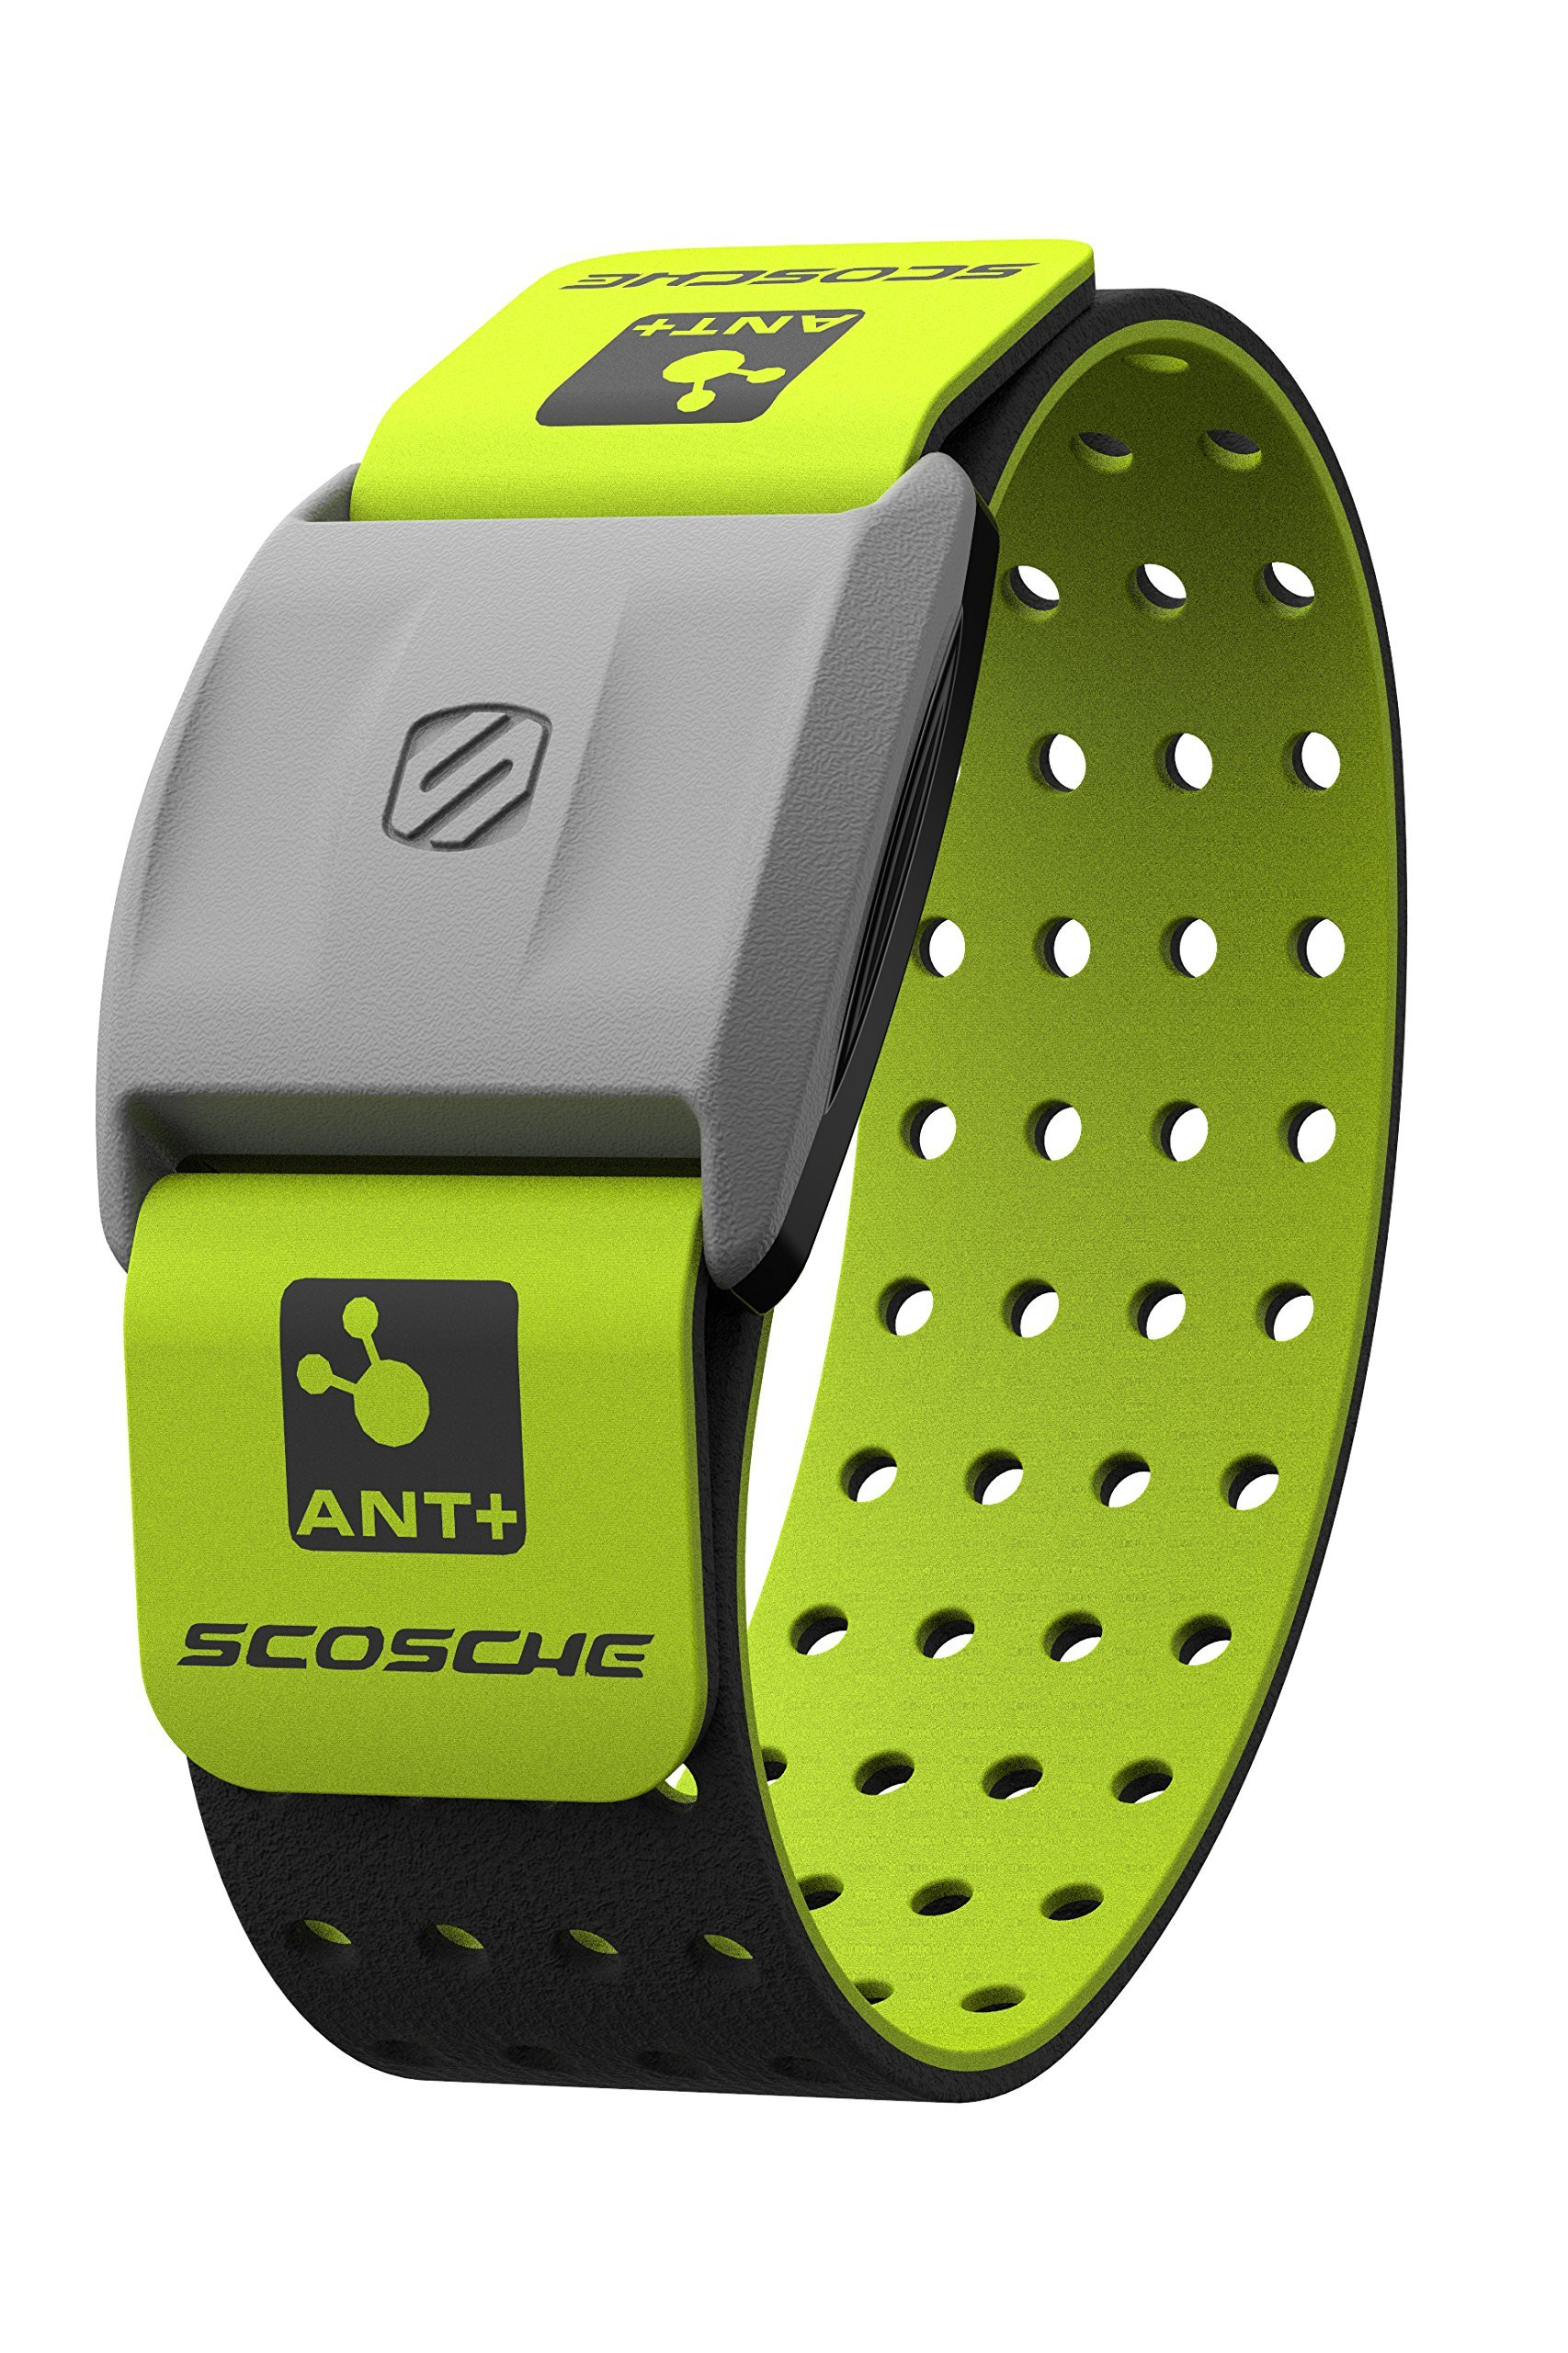 Scosche RHYTHM+ Heart Rate Monitor Armband - Green - Optical Heart Rate Armband Monitor With Dual Band Radio ANT+ and Bluetooth Smart